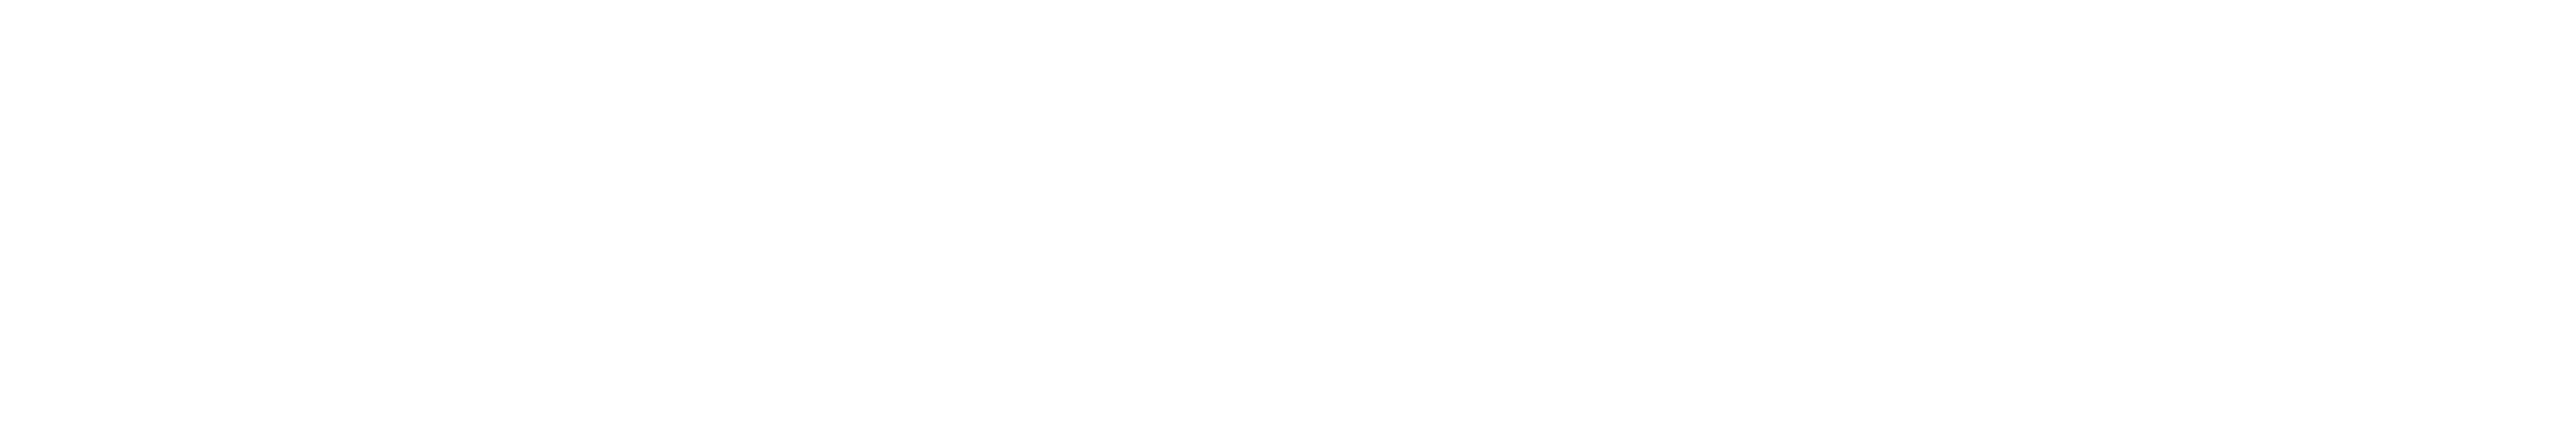 Asics London 10K (formerly British 10K) - cover image